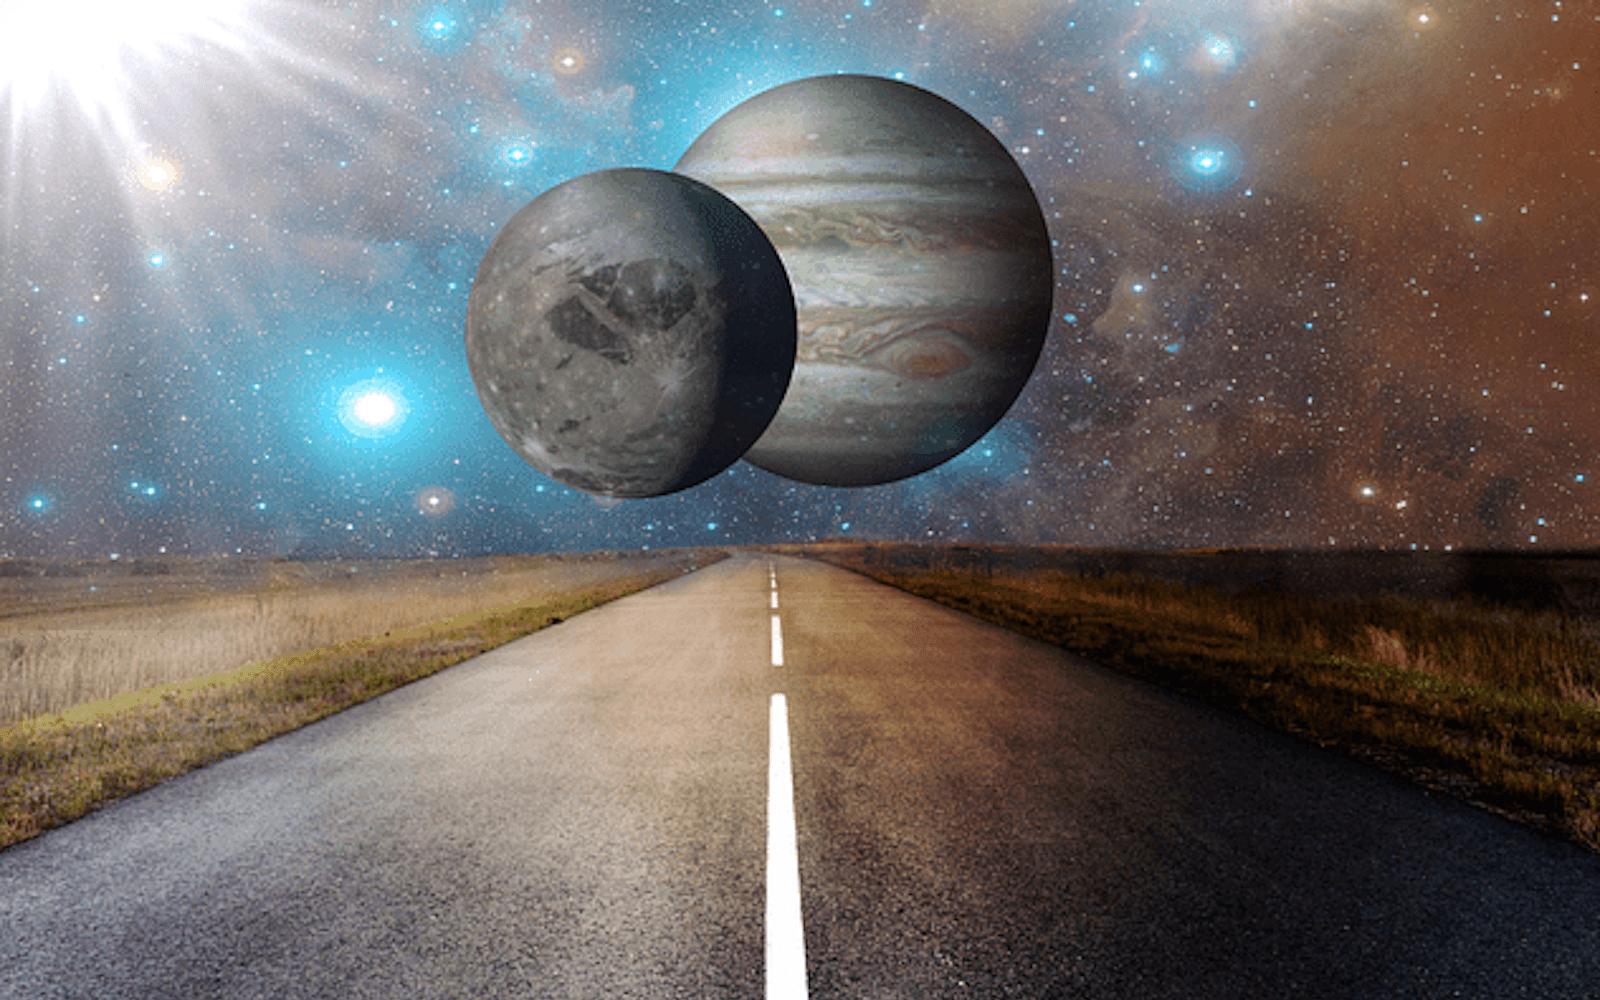 https://i2.wp.com/asiatimes.com/wp-content/uploads/2020/12/Jupiter-Saturn-Great-Conjucture-e1608544035192.png?w=1600&ssl=1